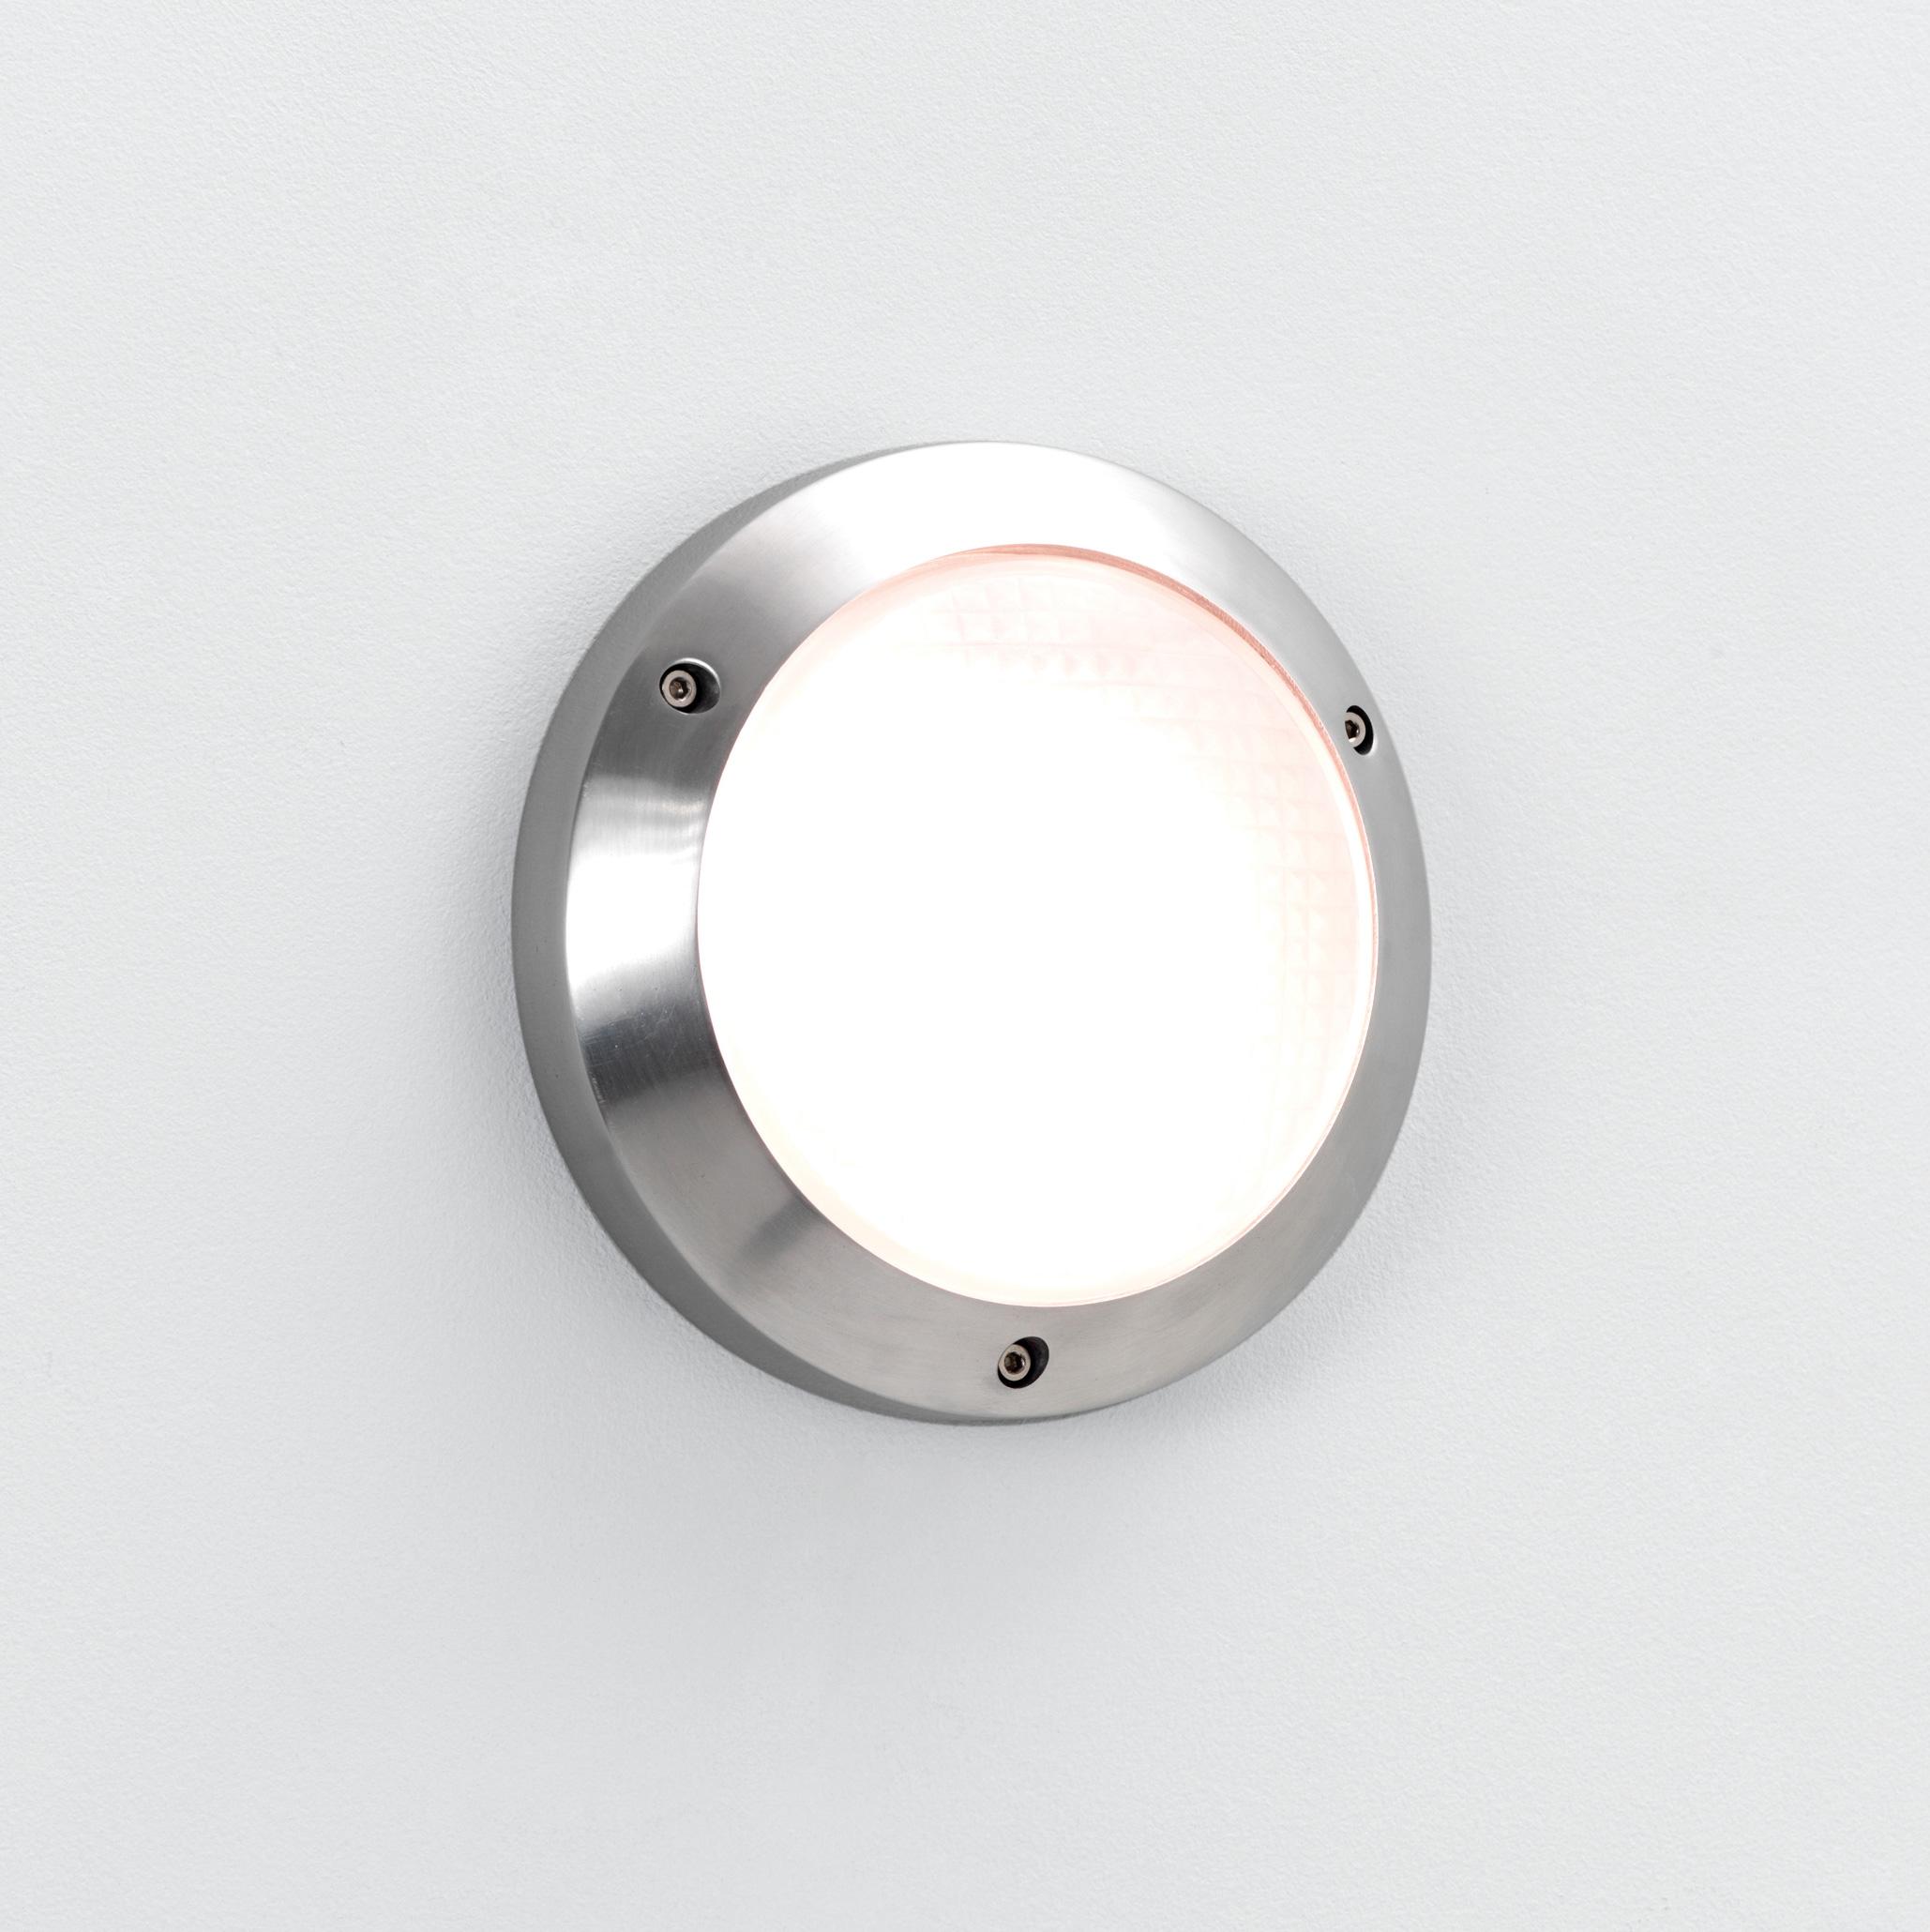 ASTRO Toronto Plus 170 0604 round bathroom wall light 1x9W GX53 lamp aluminium Liminaires